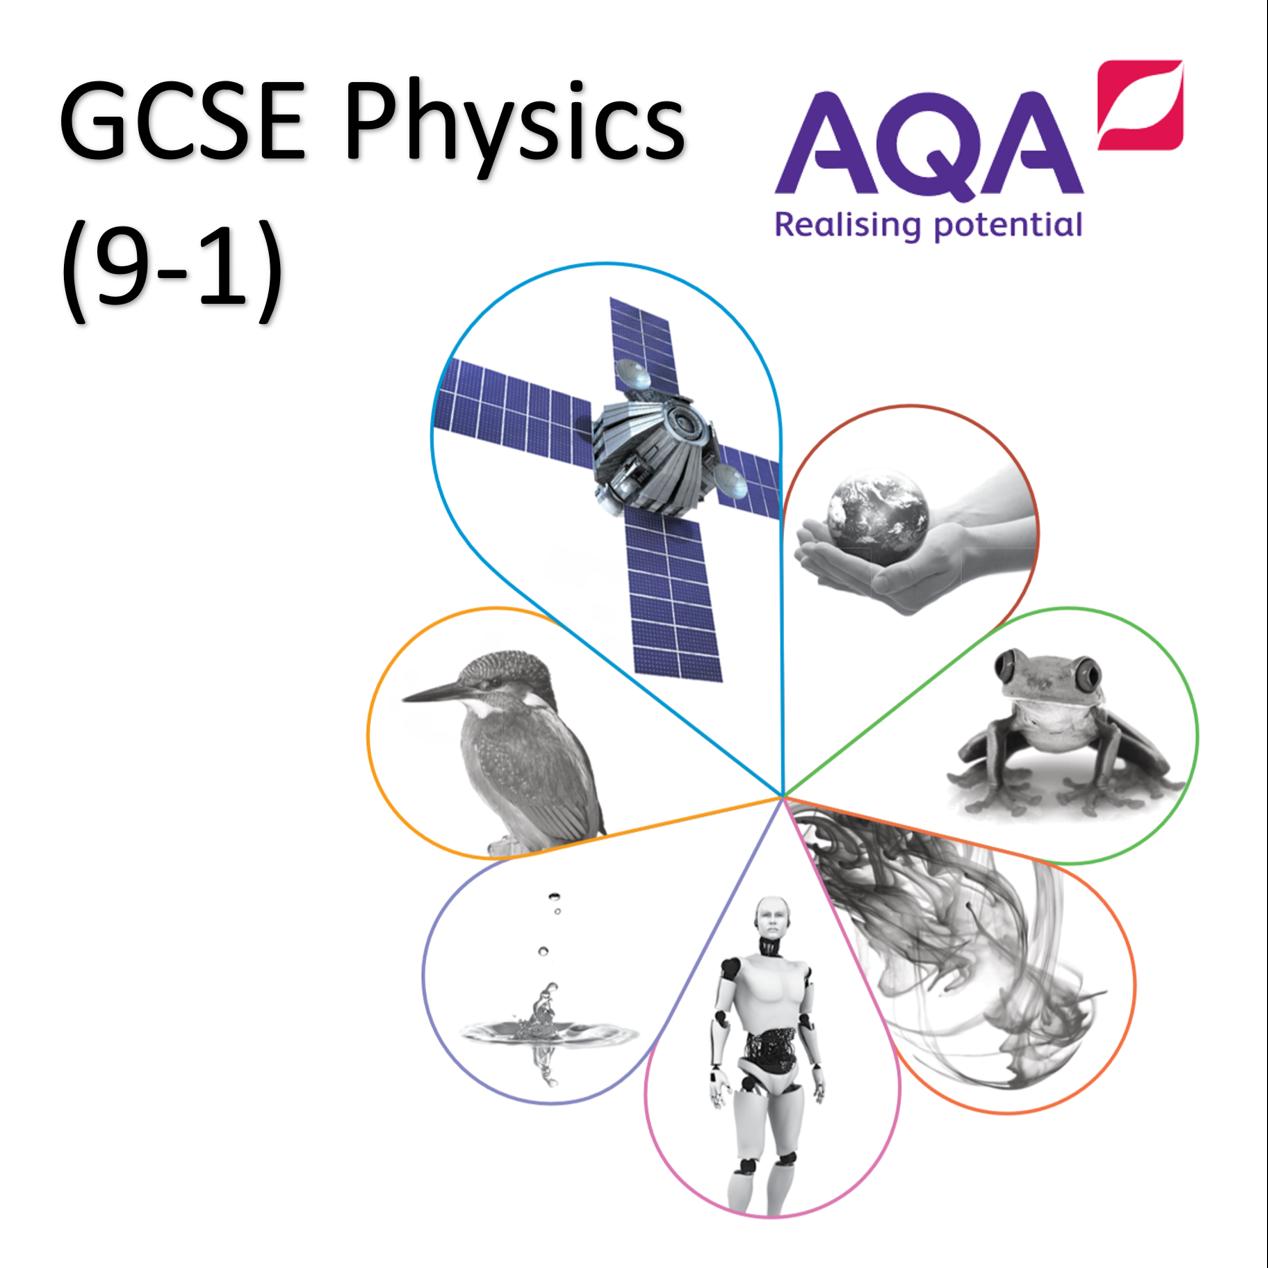 AQA GCSE Physics (9-1) Paper 1 Triple Science Revision Summary Sheets